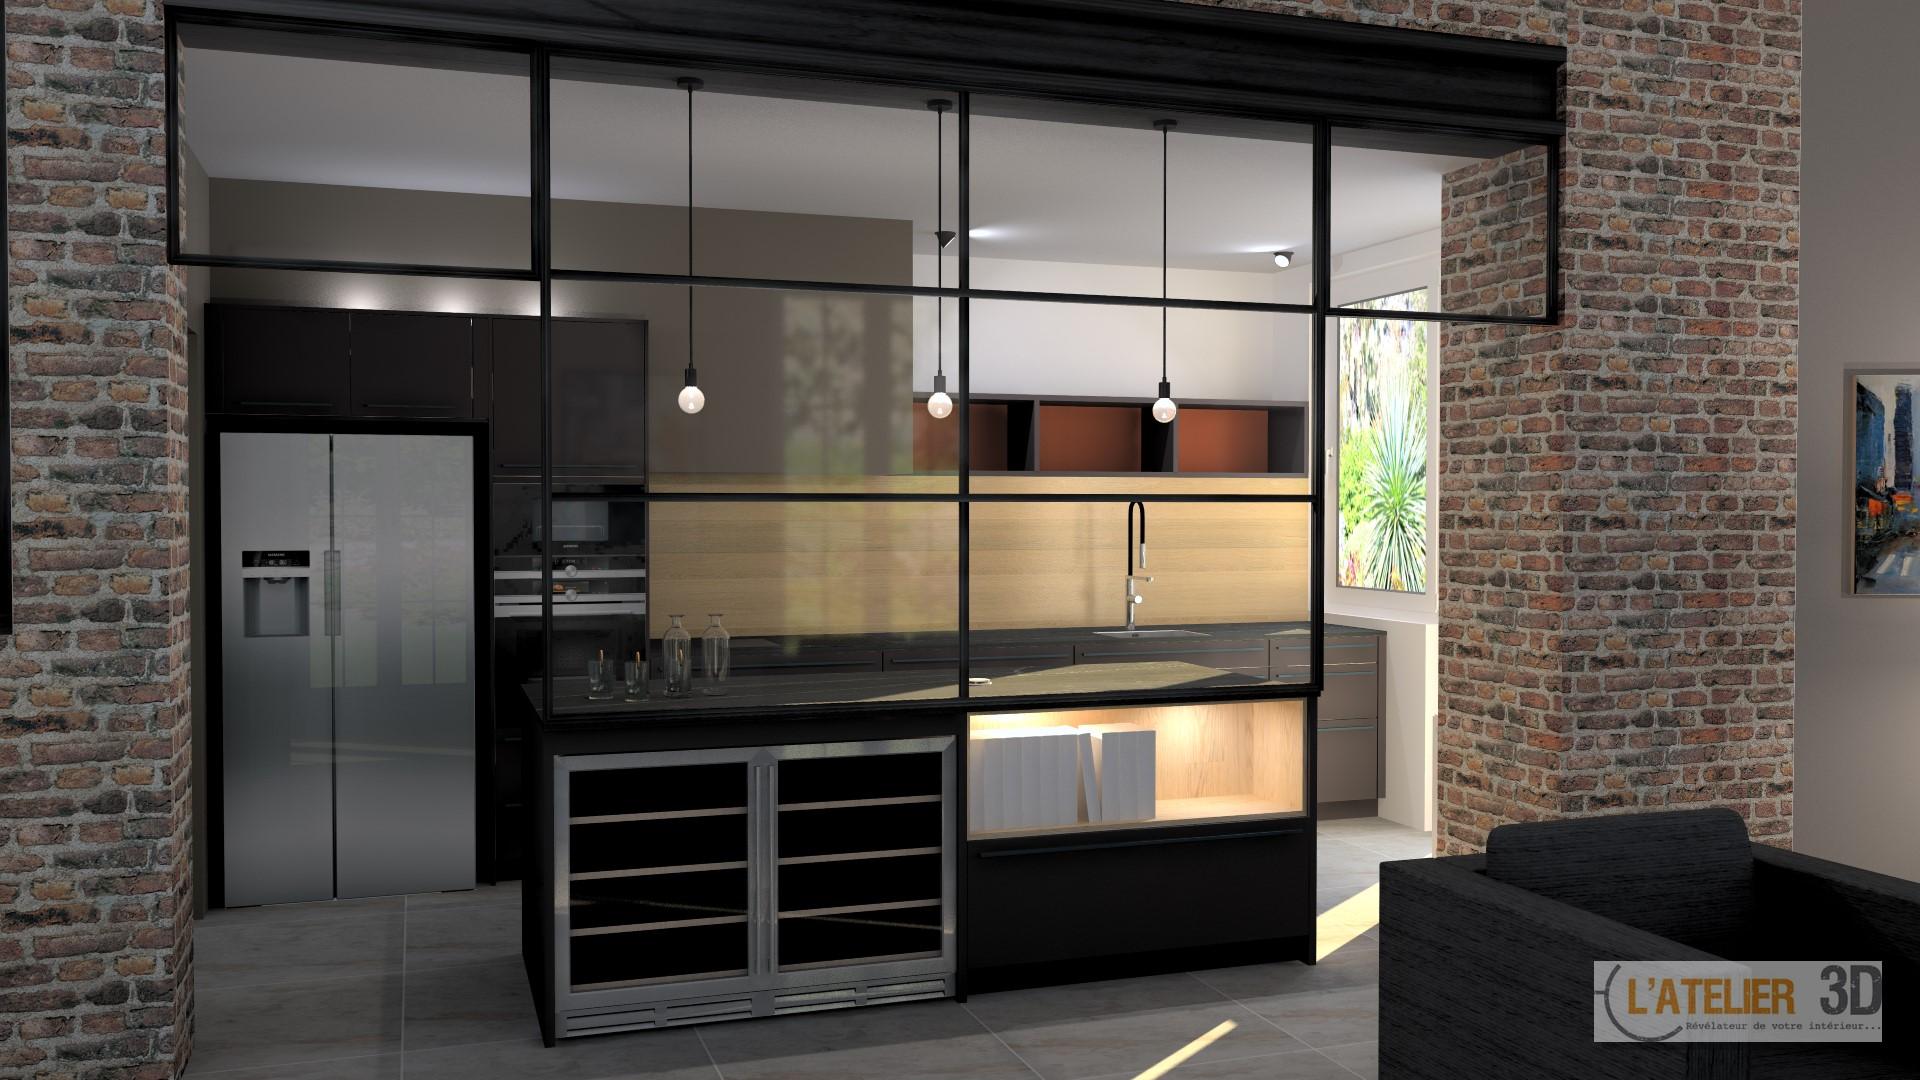 2017 tendances verri res et escaliers hagane. Black Bedroom Furniture Sets. Home Design Ideas